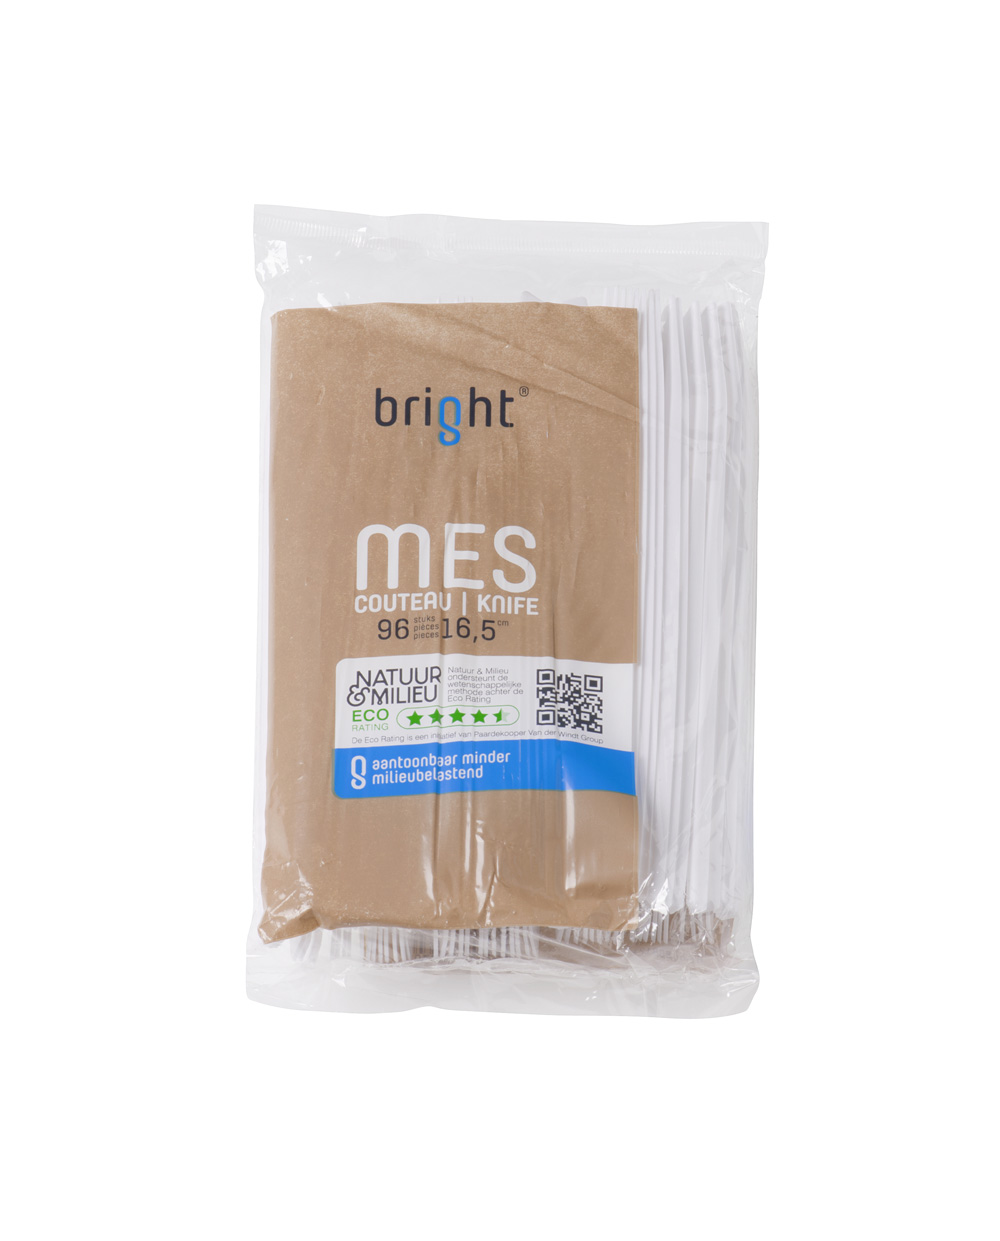 888121_bright_P